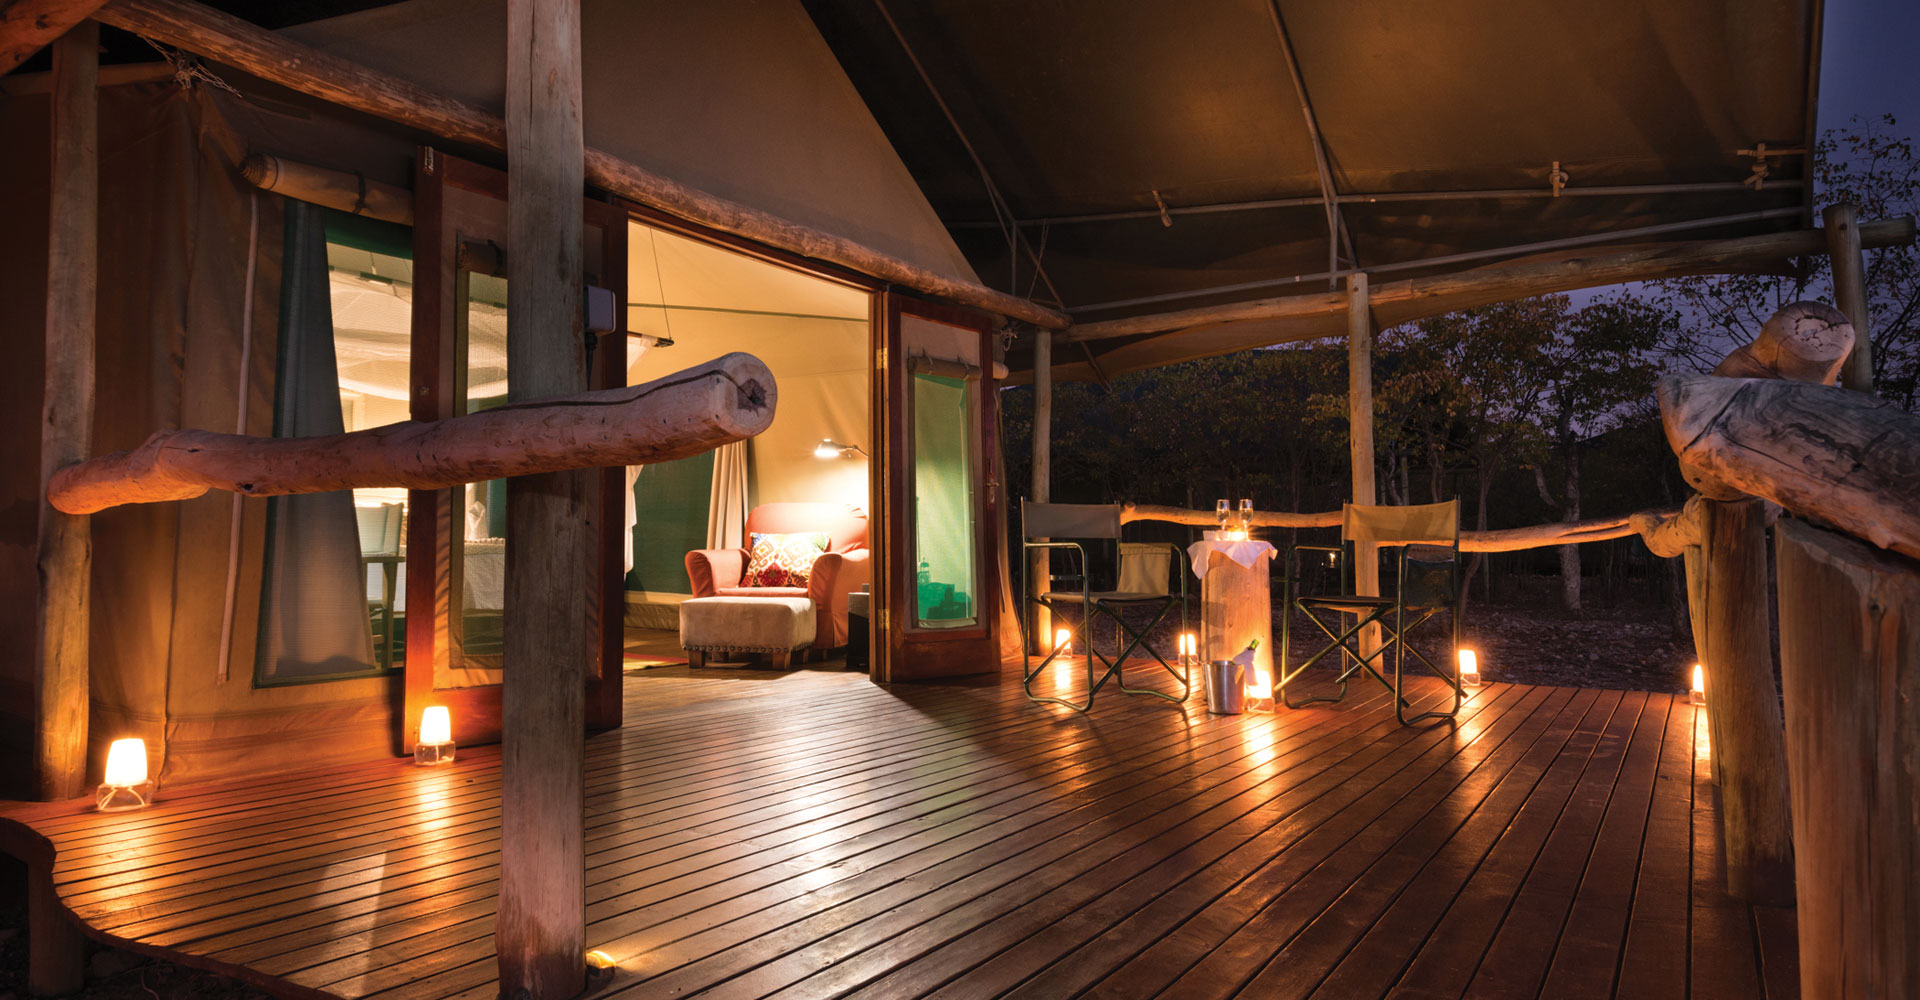 ONGAVA TENTED CAMP & Tented Camp - Ongava - Home of the Luxury Safari